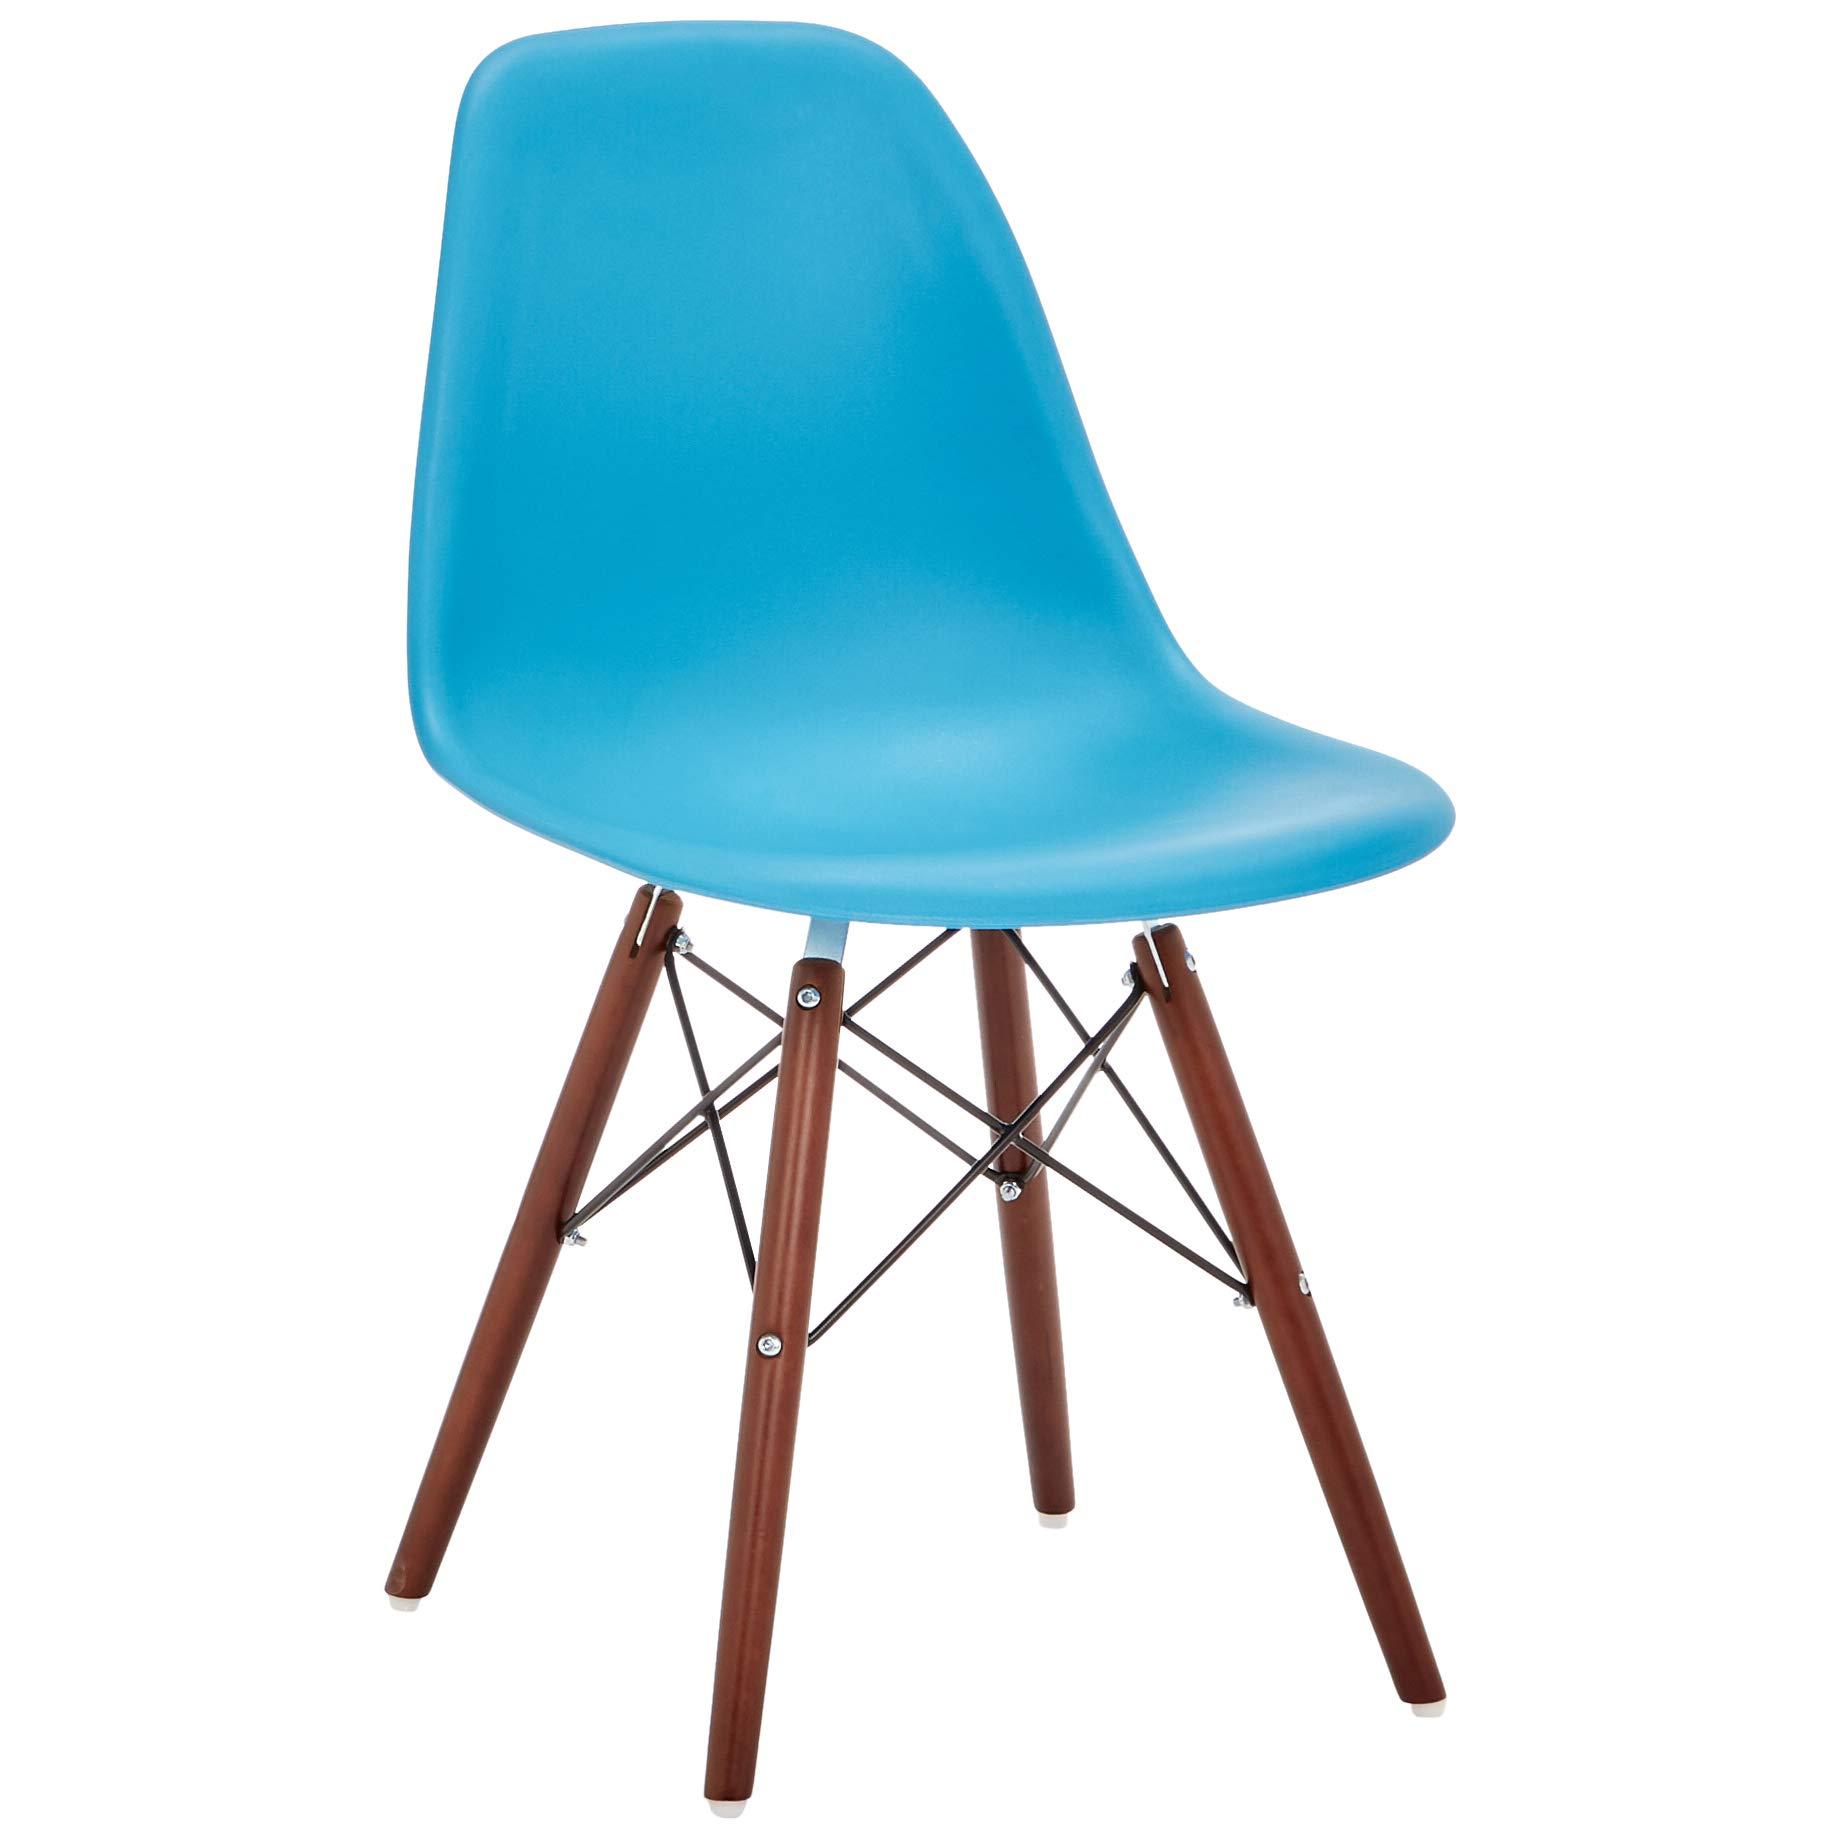 Phoenix Home AVH072002 Dining Chair, 21'' Length x 18.5'' Width x 32.5'' Height, Aqua